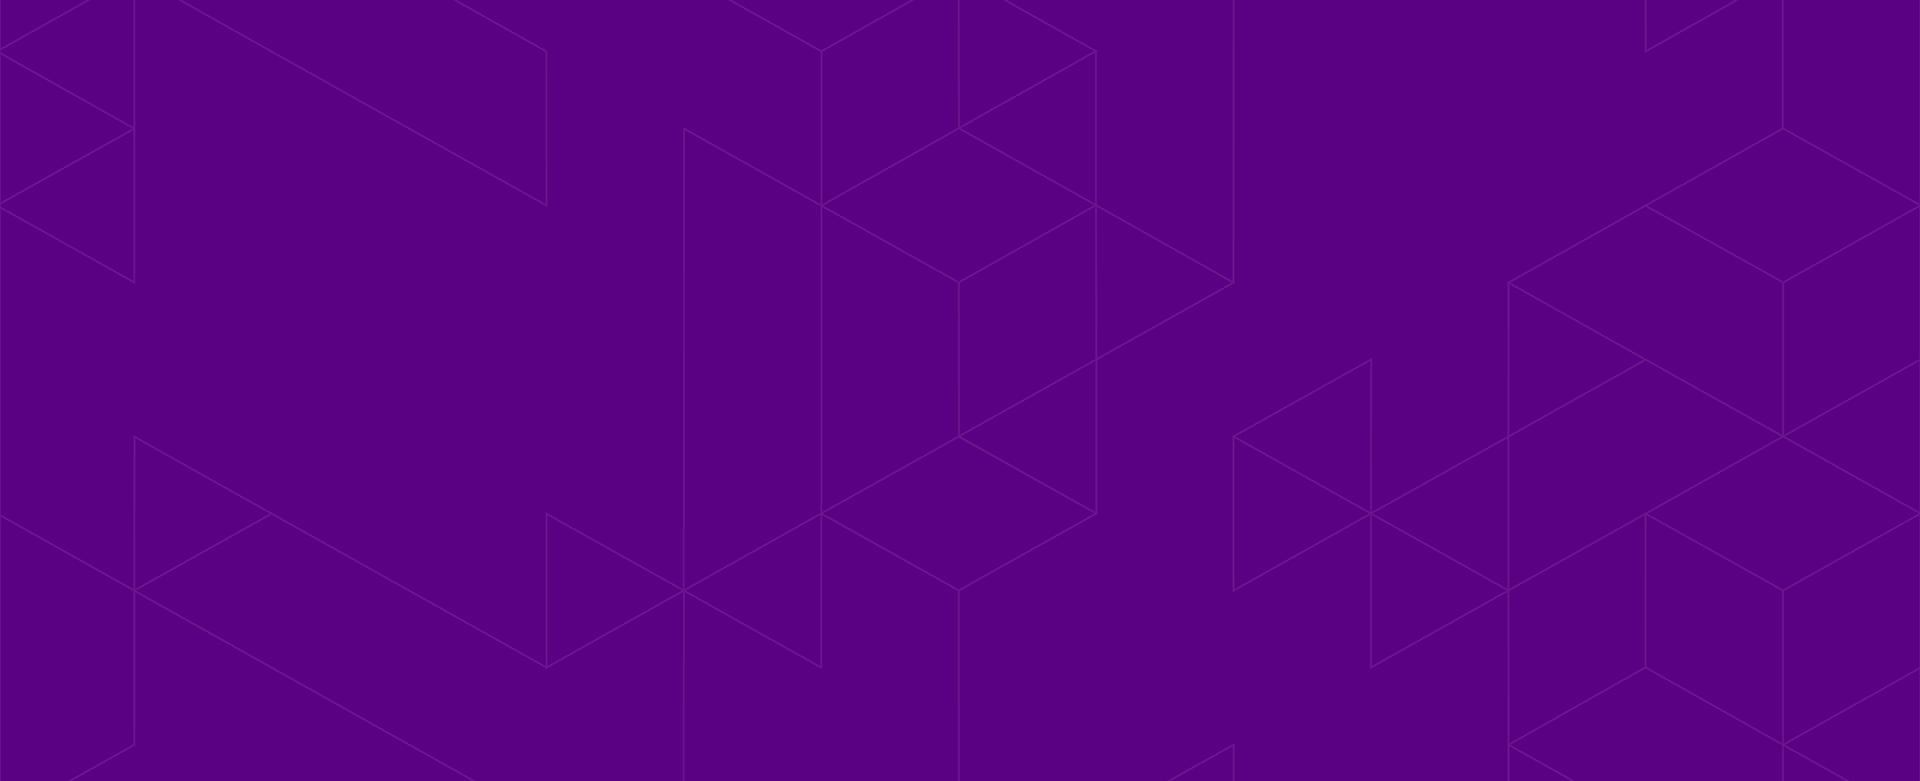 Lorca Live - Banner Purple Background